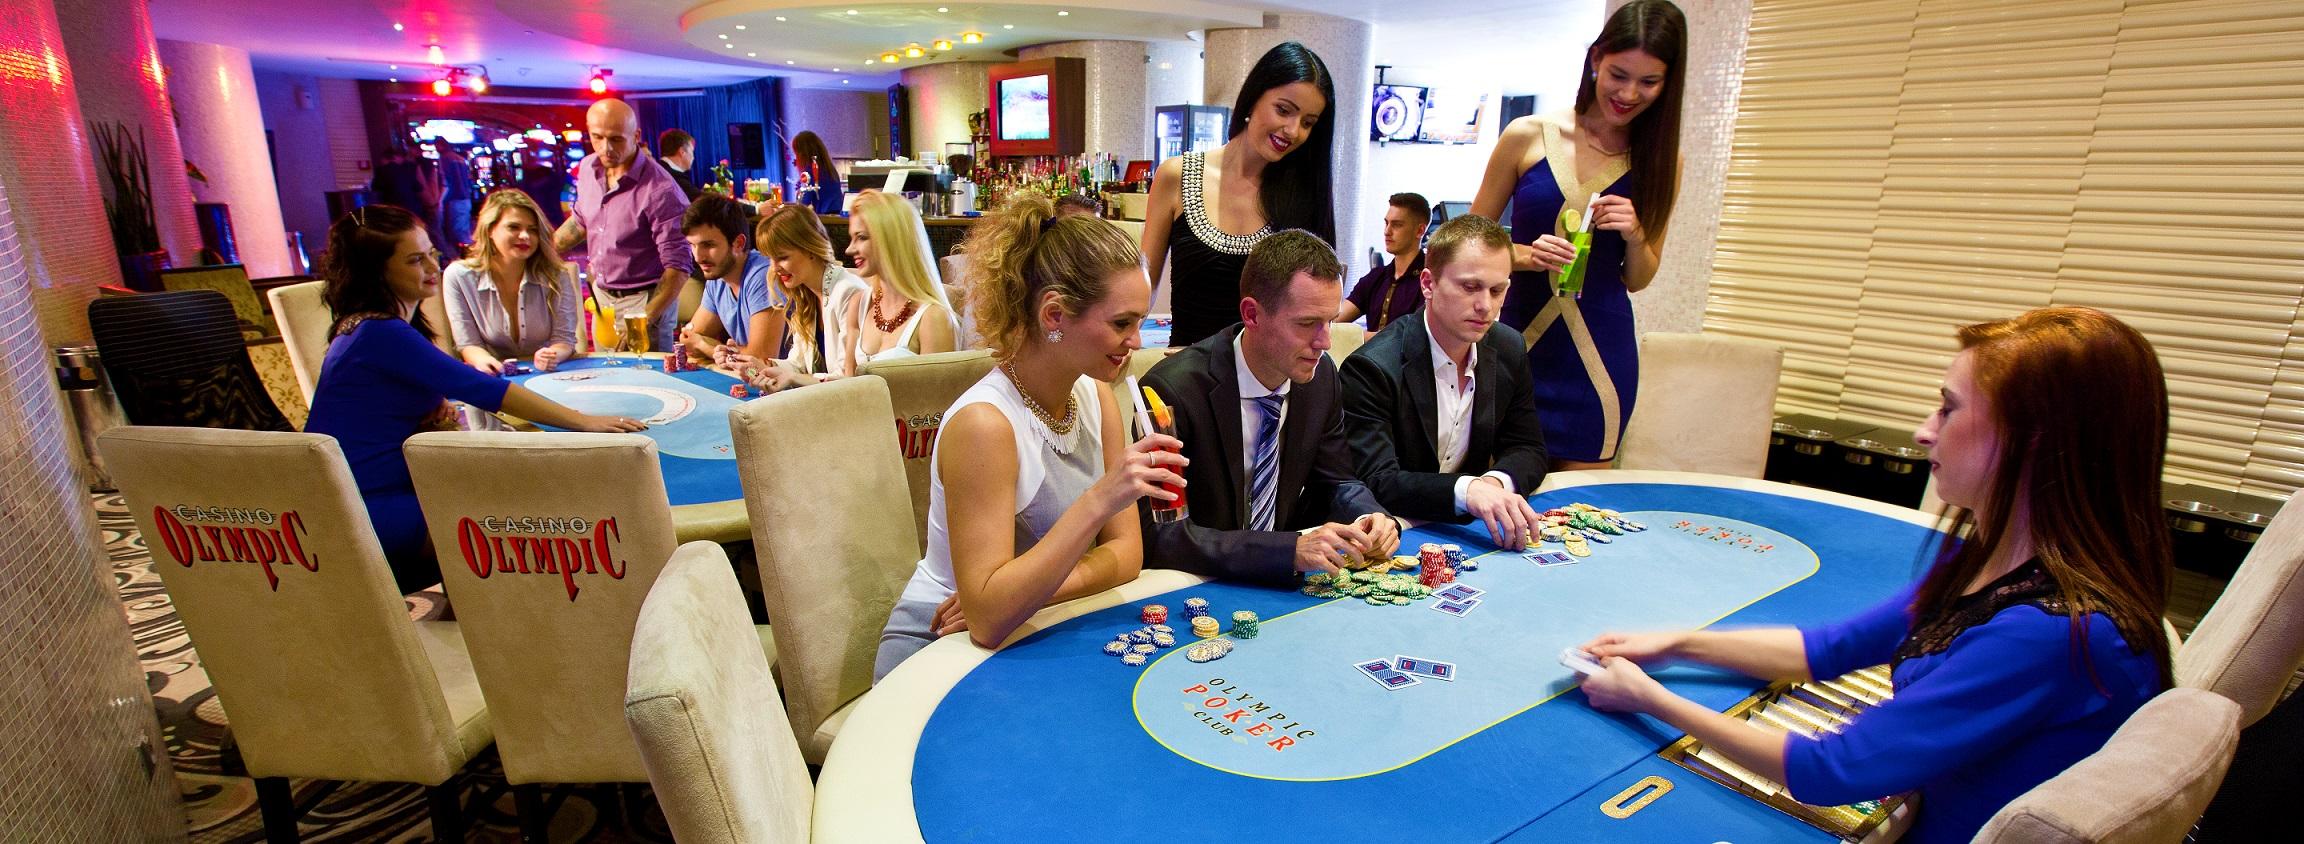 olympic_bratislava_casino__2_.jpg